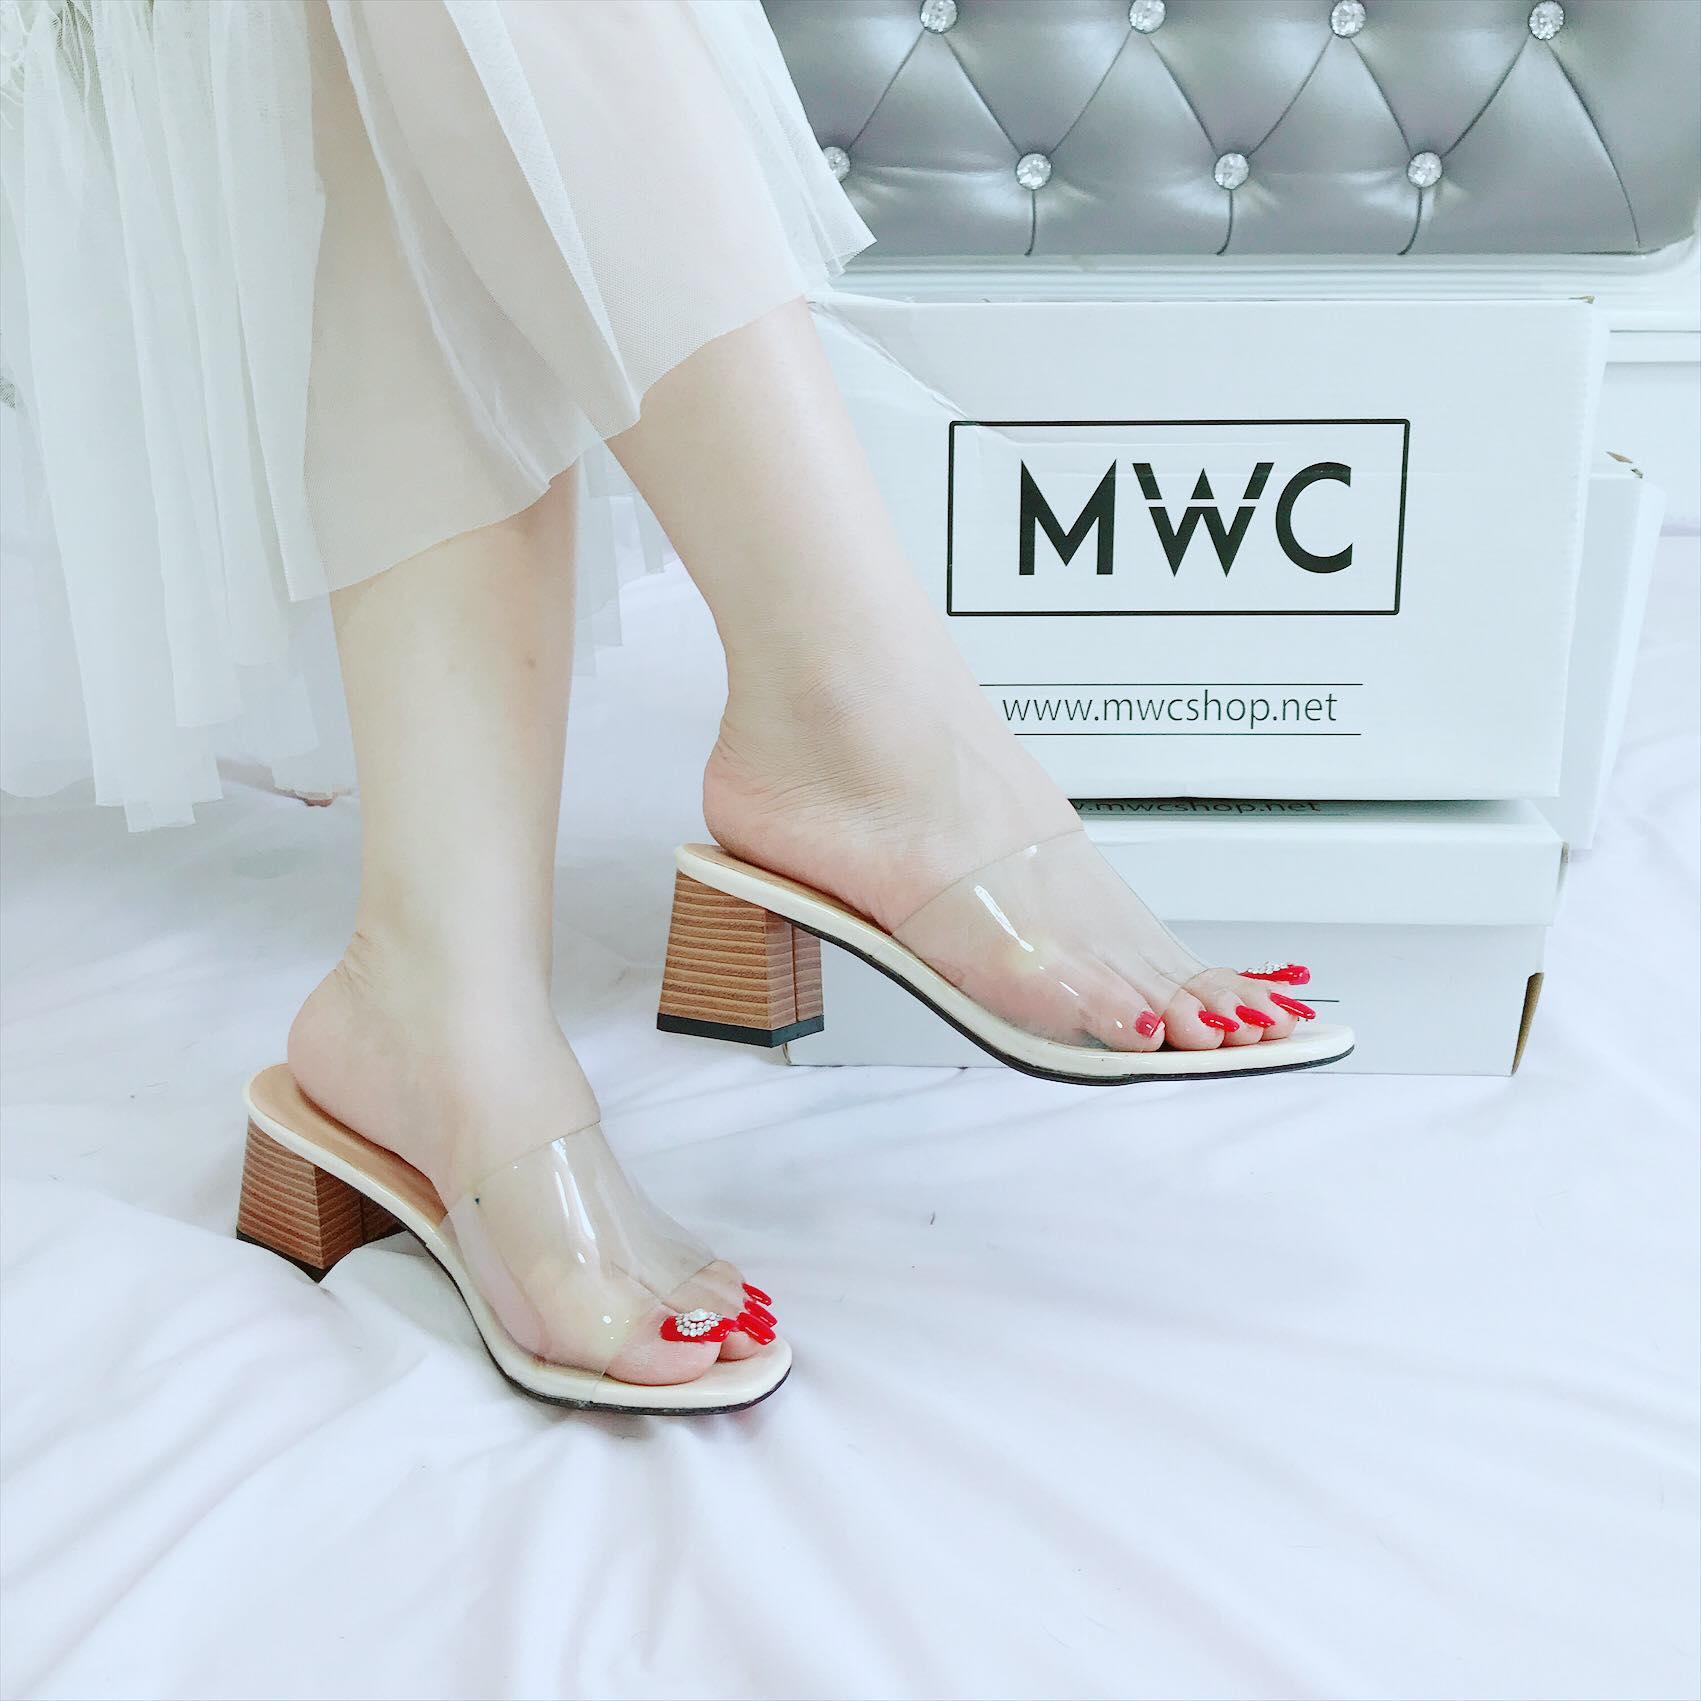 Giày cao gót MWC NUCG- 3678 - KEM